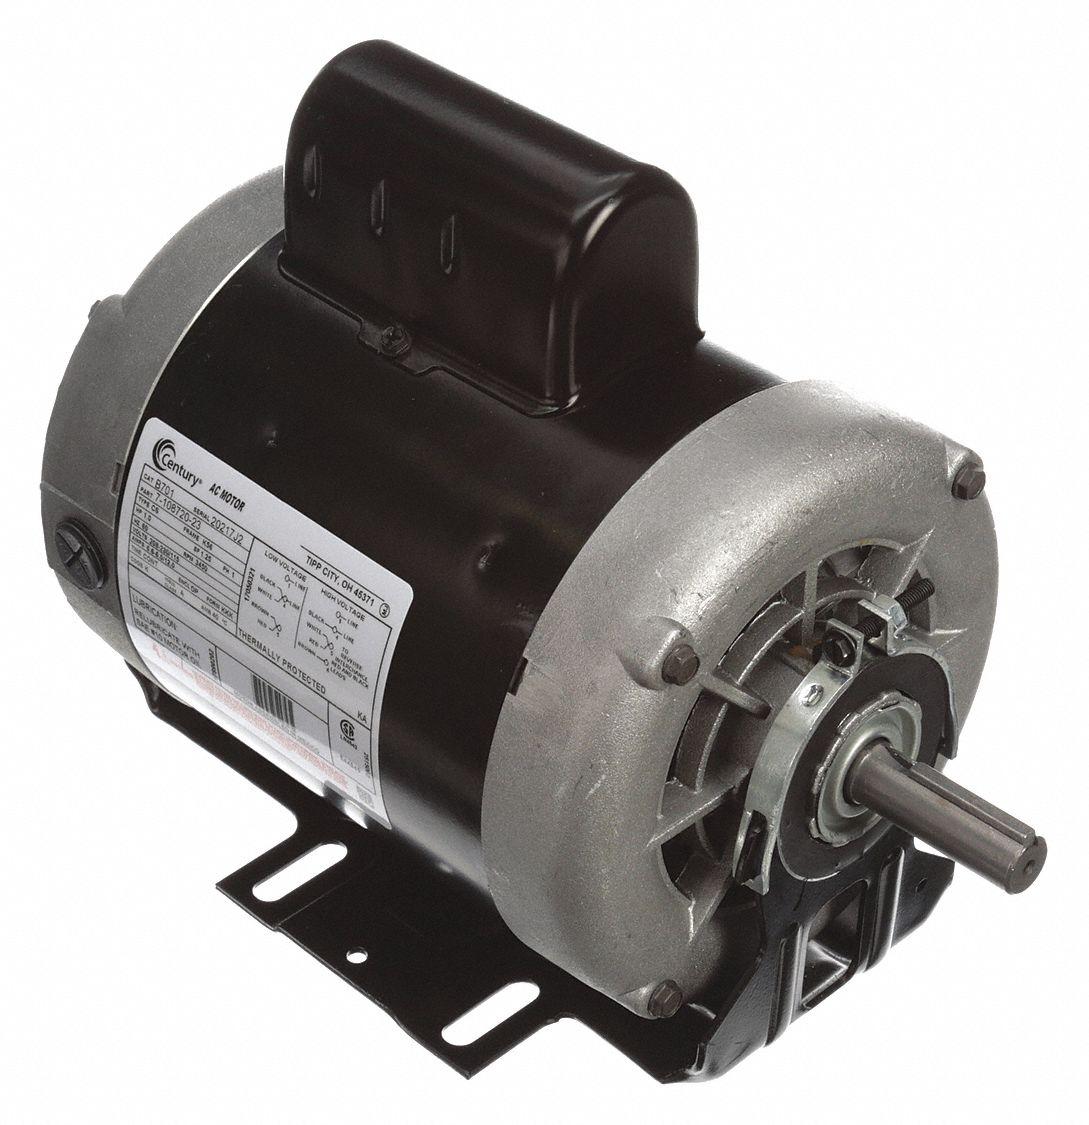 1 HP Belt Drive Motor, Capacitor-Start, 3450 Nameplate RPM, 115/208-230  Voltage, Frame 56